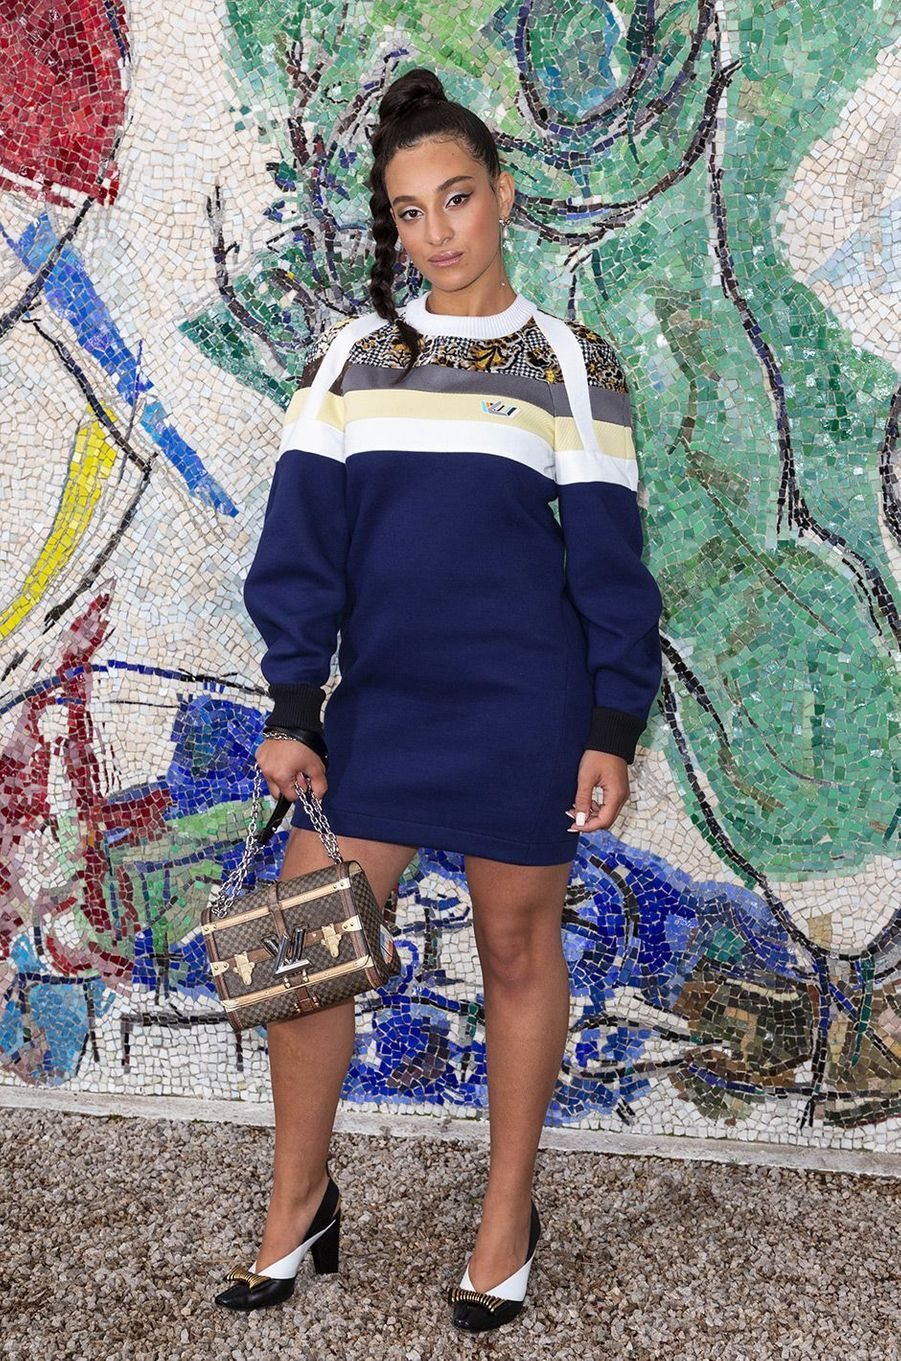 Camelia Jordana au défilé Louis Vuitton à la fondation Maeght lundi 28 mai